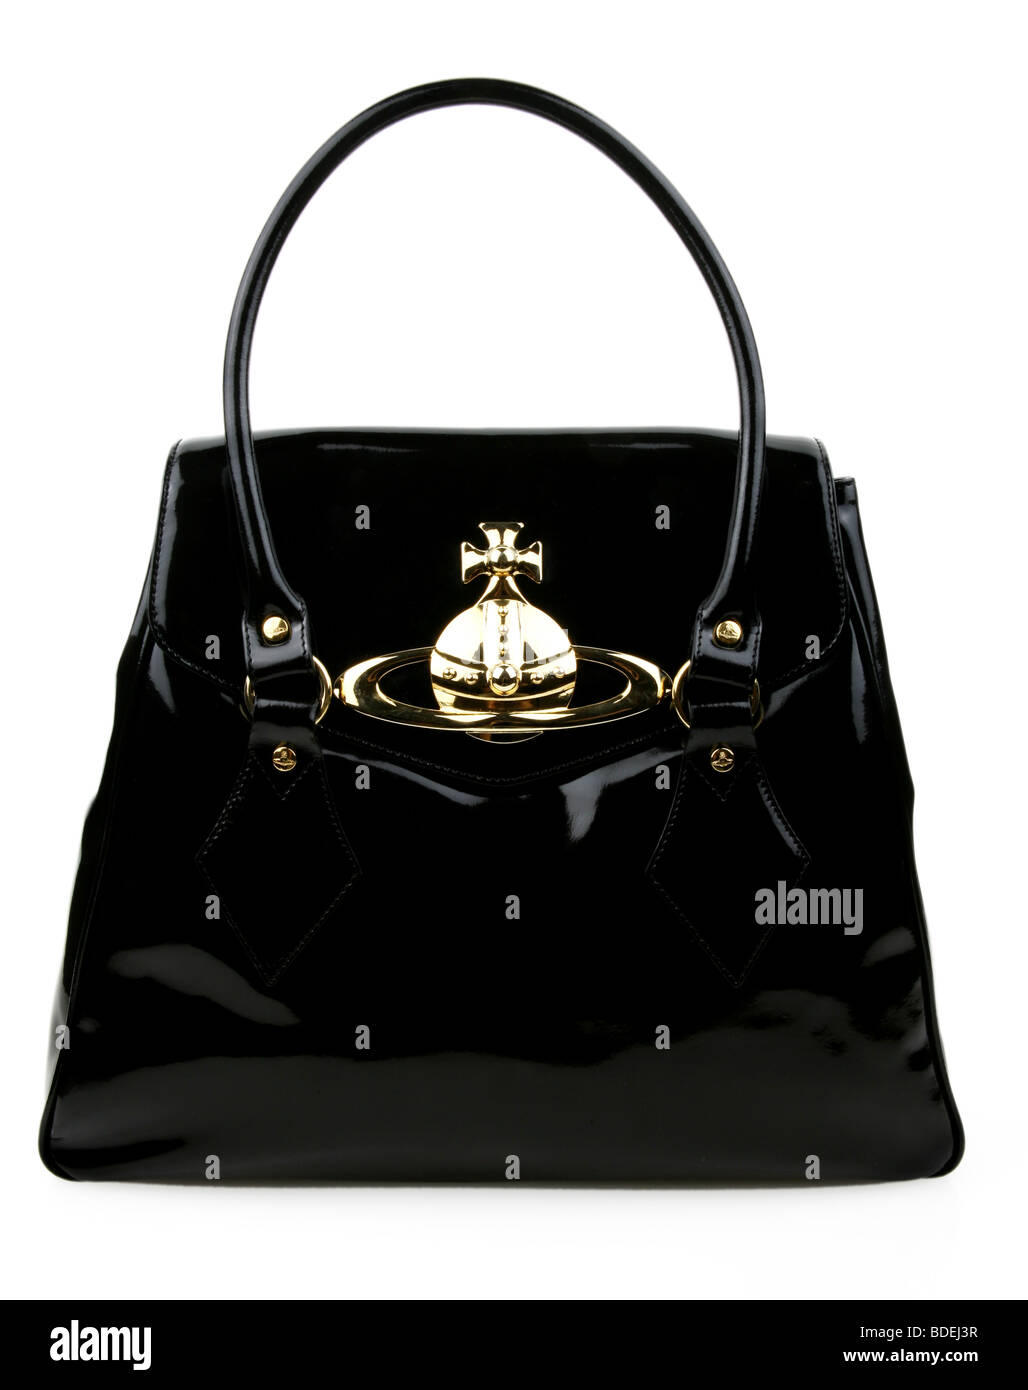 ac5a942b8b44f Vintage schwarze patent 50er Jahre Leder Handtasche Kelly Stil. Bild-ID   AX412J (RF). Vivienne Westwood Lackleder Tasche Stockbild